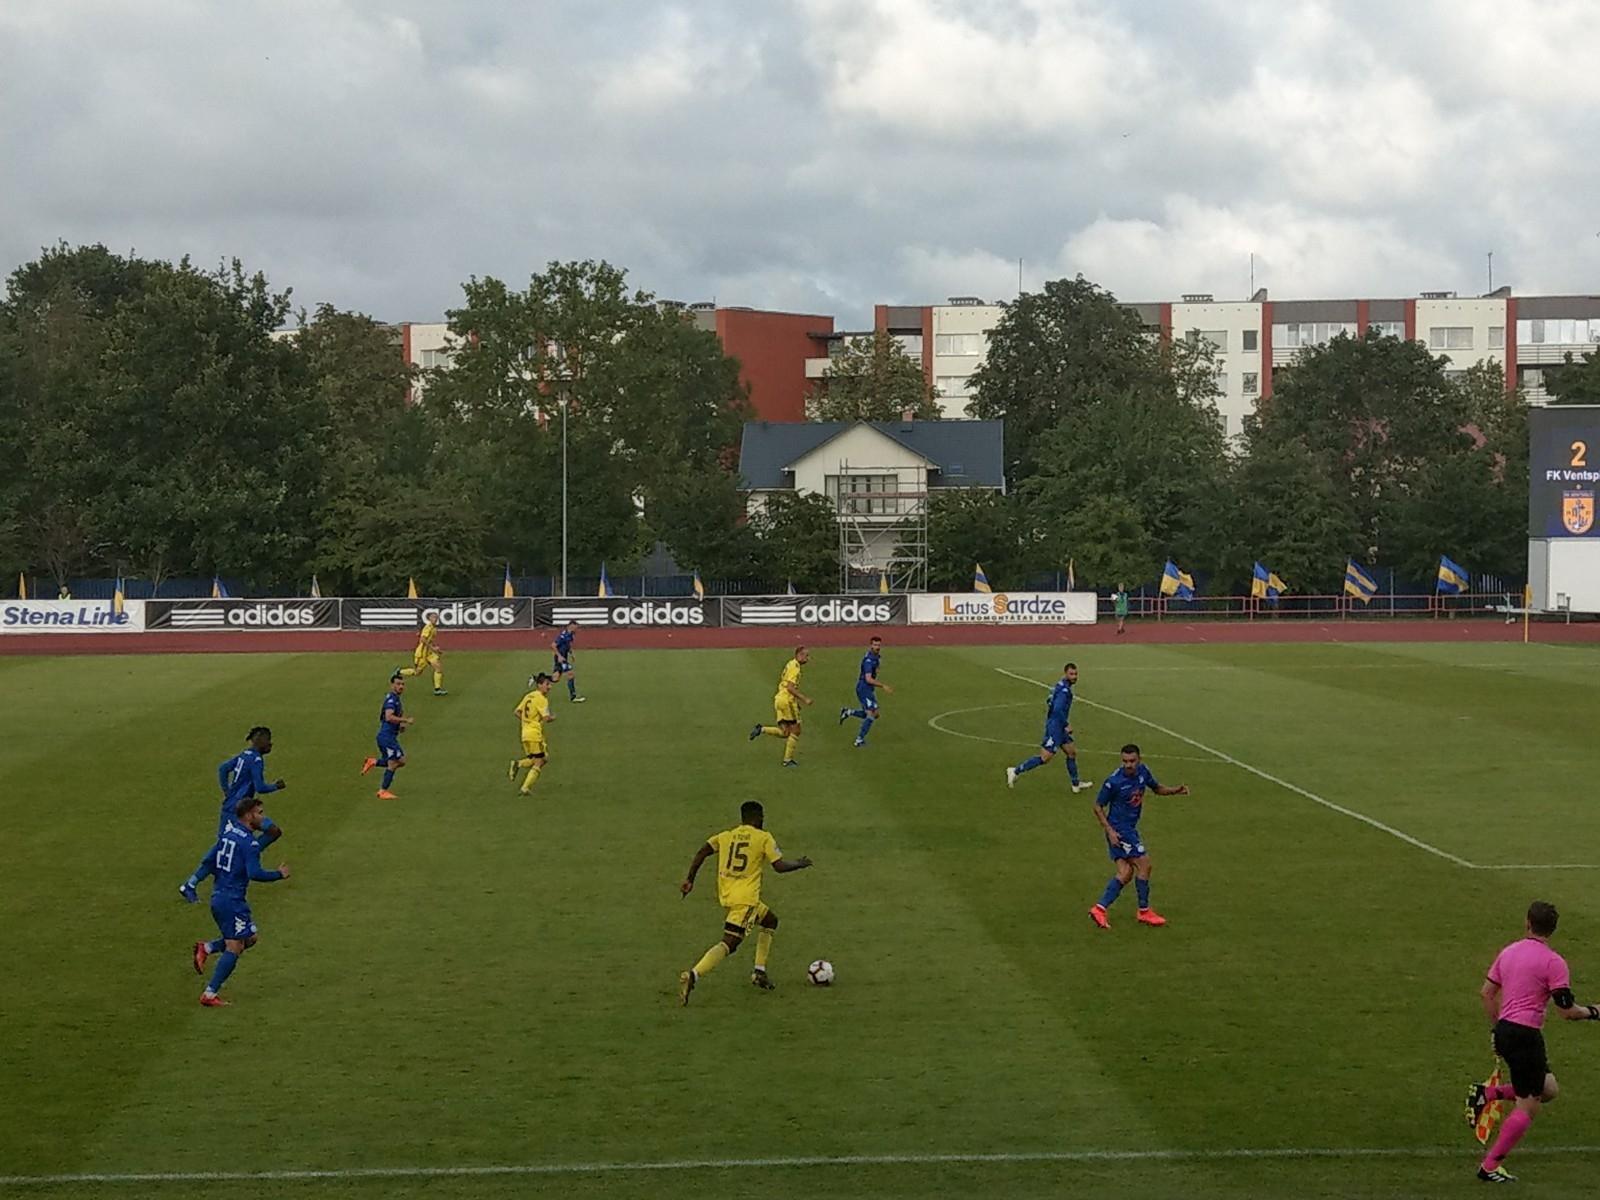 FK Ventspils - KF Teuta - 2019 - 12